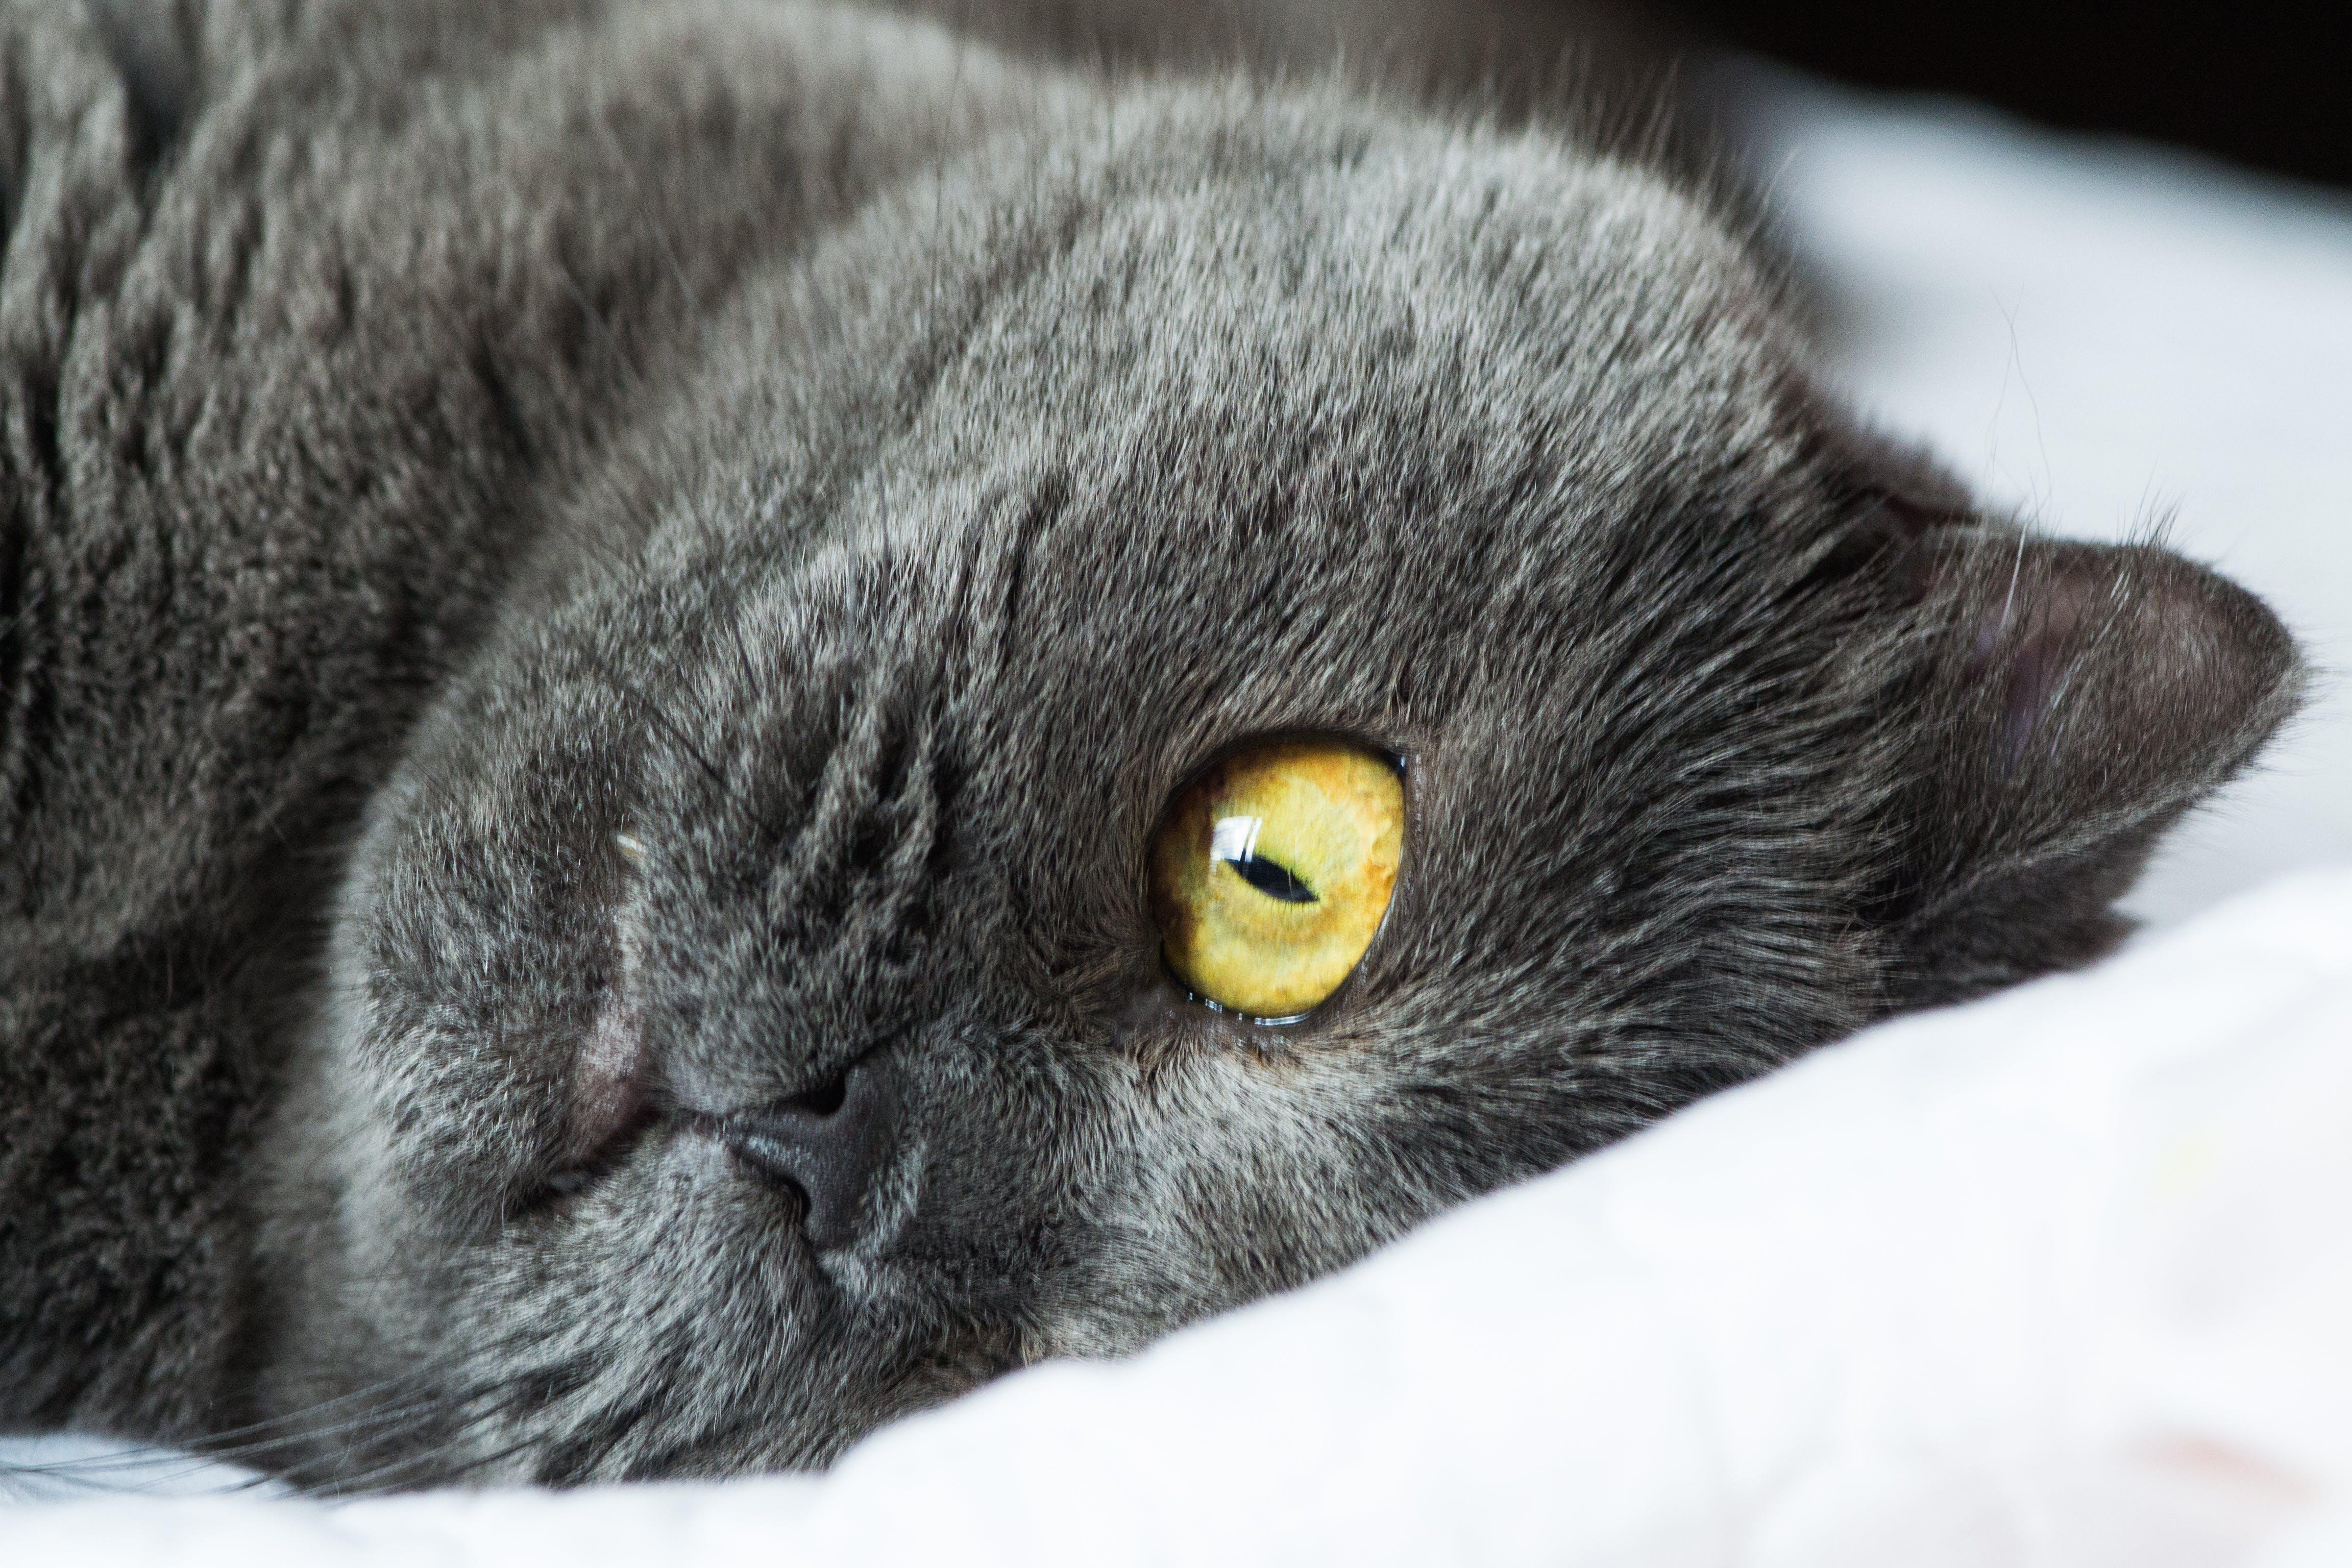 Close Up Photo Of Black Cat